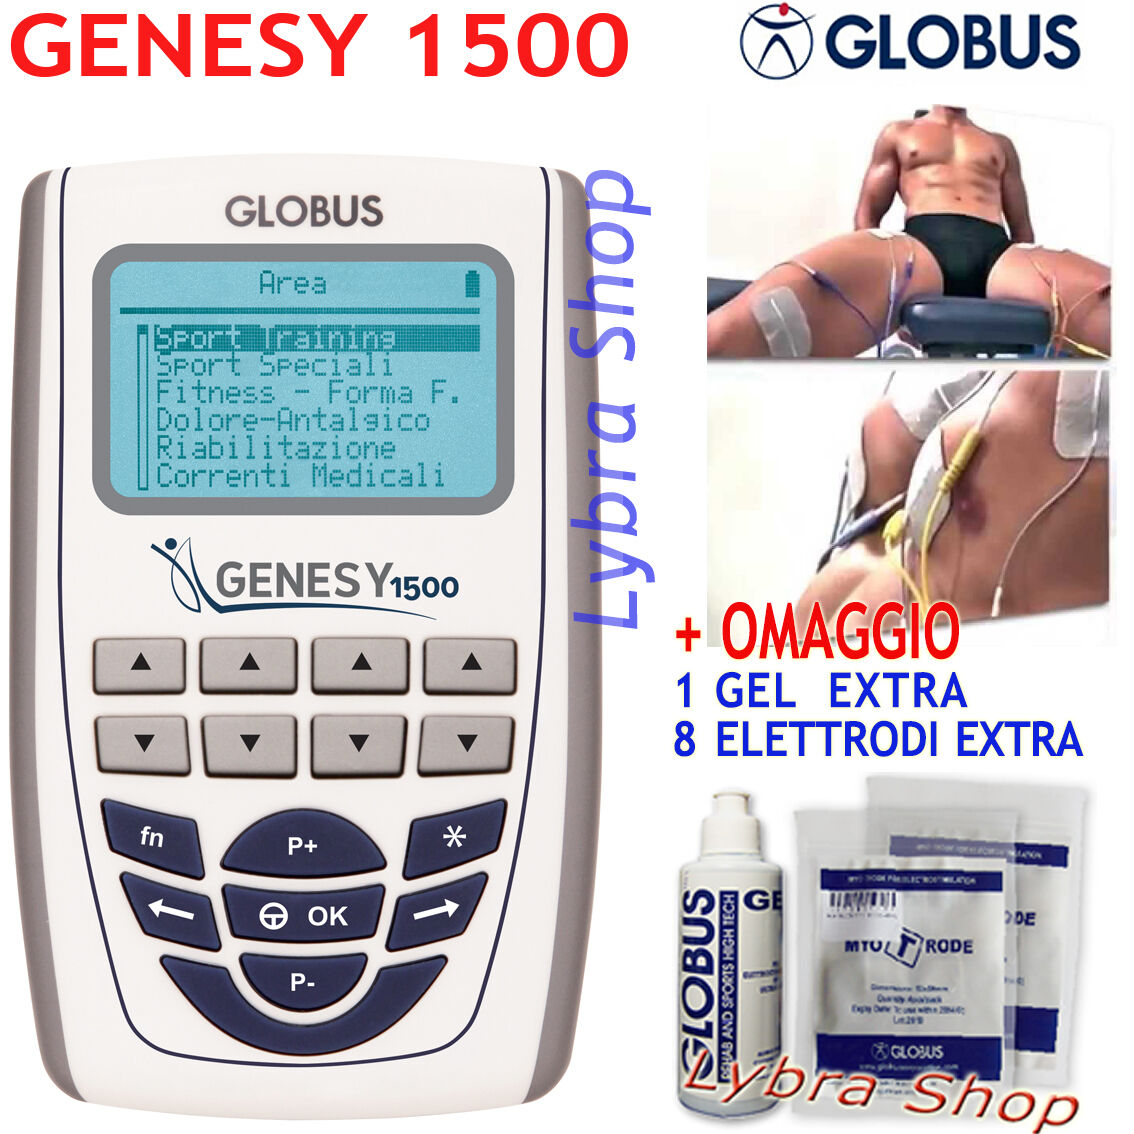 Globus GENESY 1500 elettrostimolatore PROFESSIONALE Sport Correnti Medicali